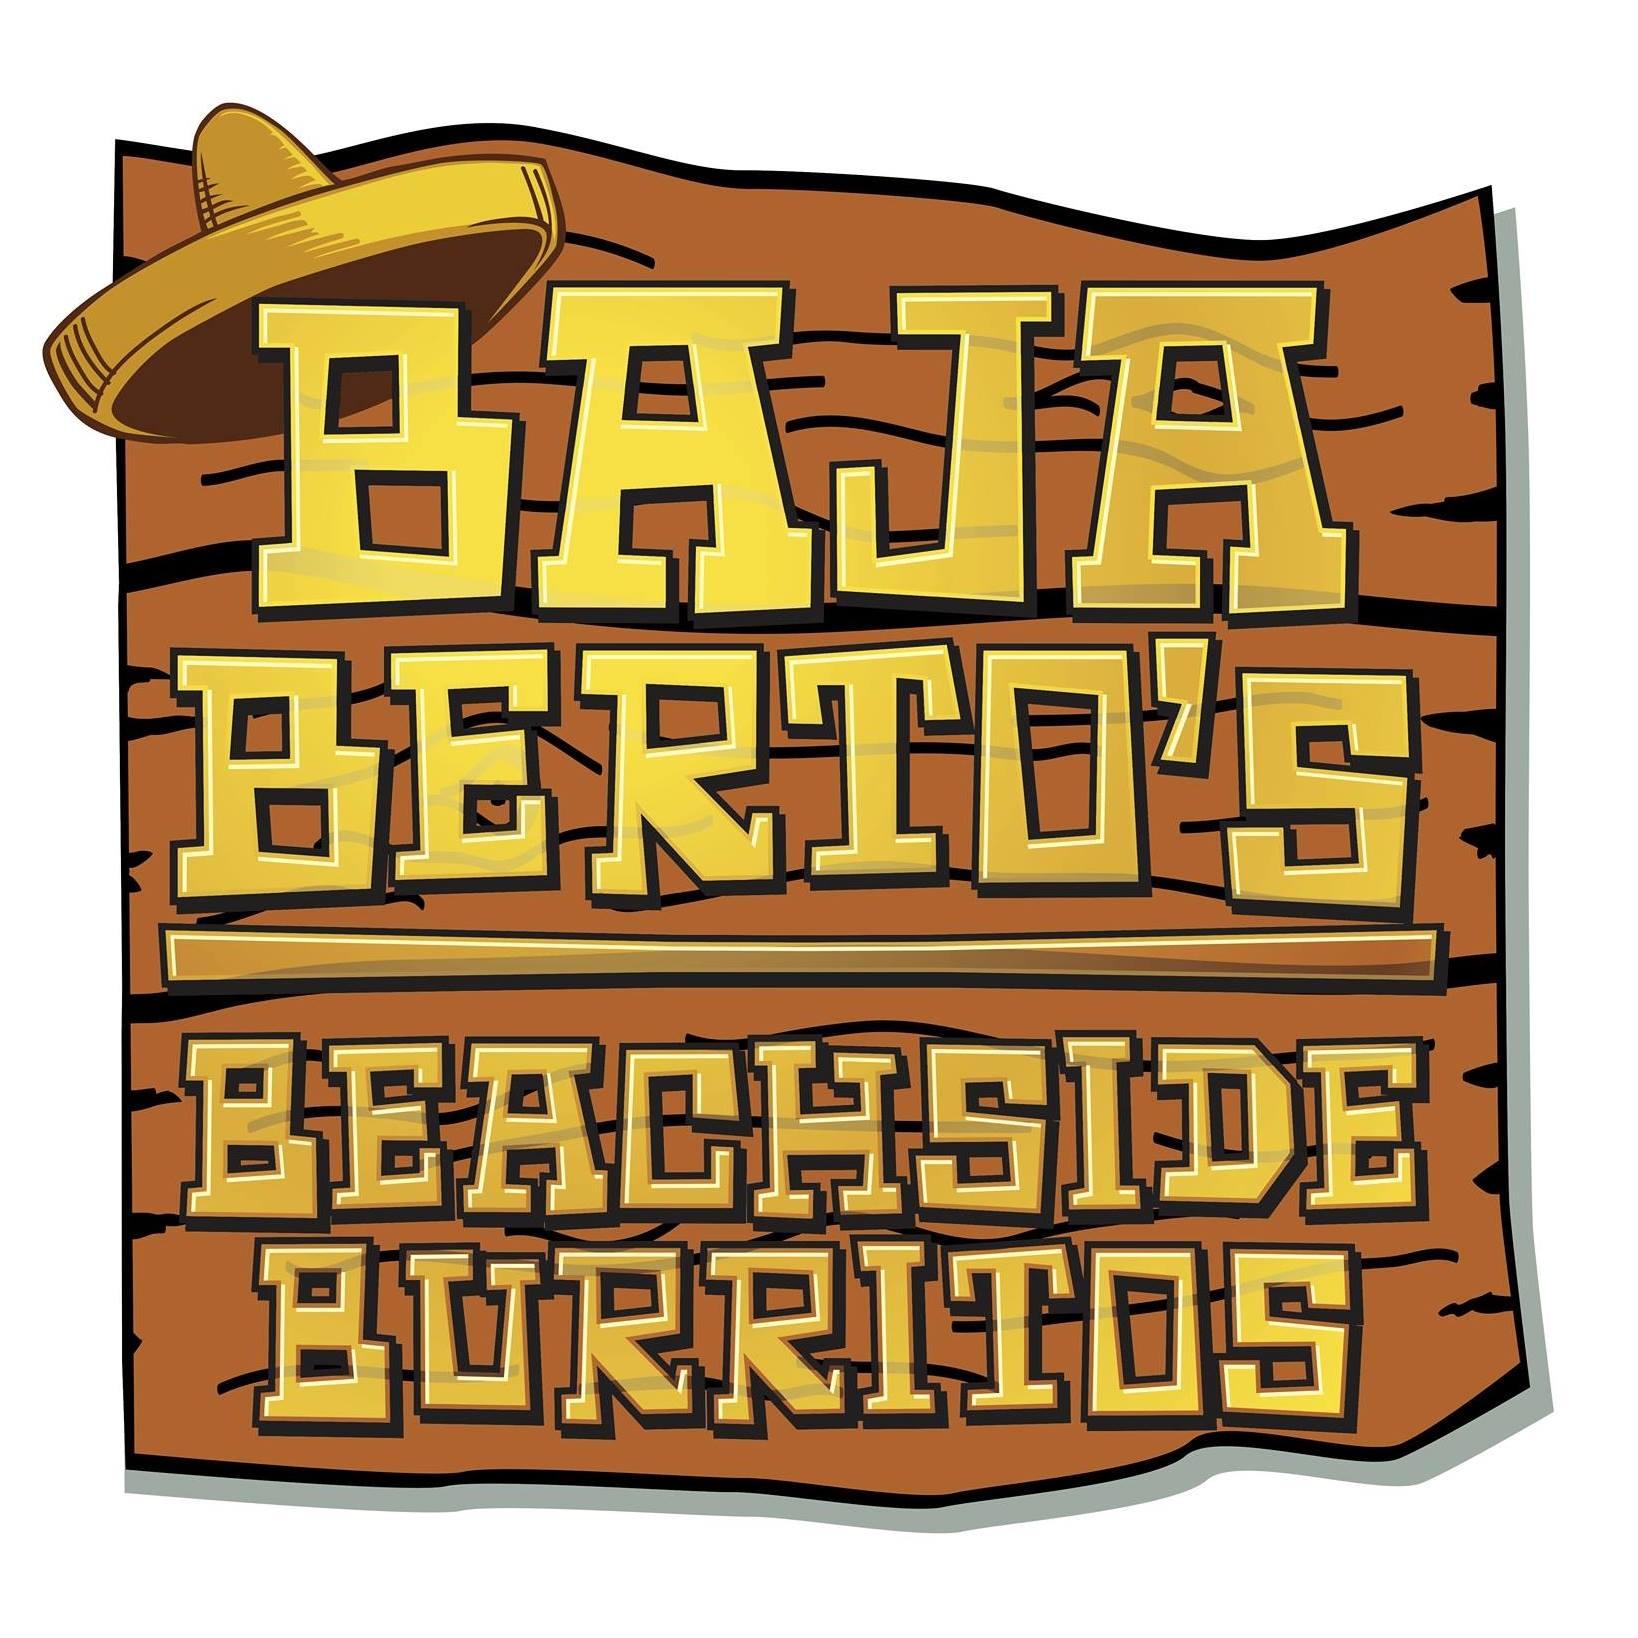 Baja Berto's Beachside Burritos logo